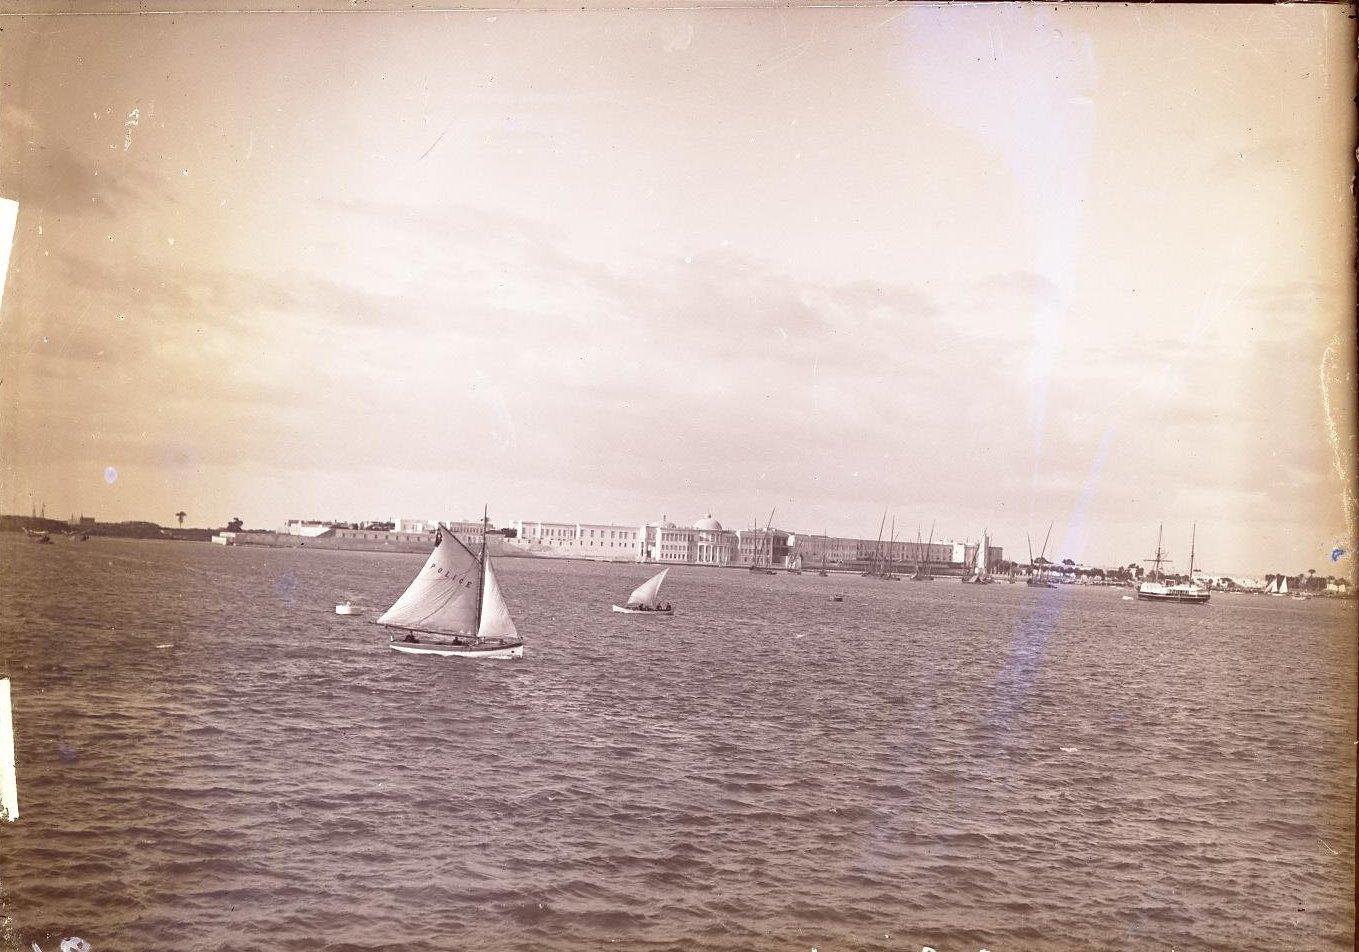 02. Египет. Вид на Александрию. полицейская лодка